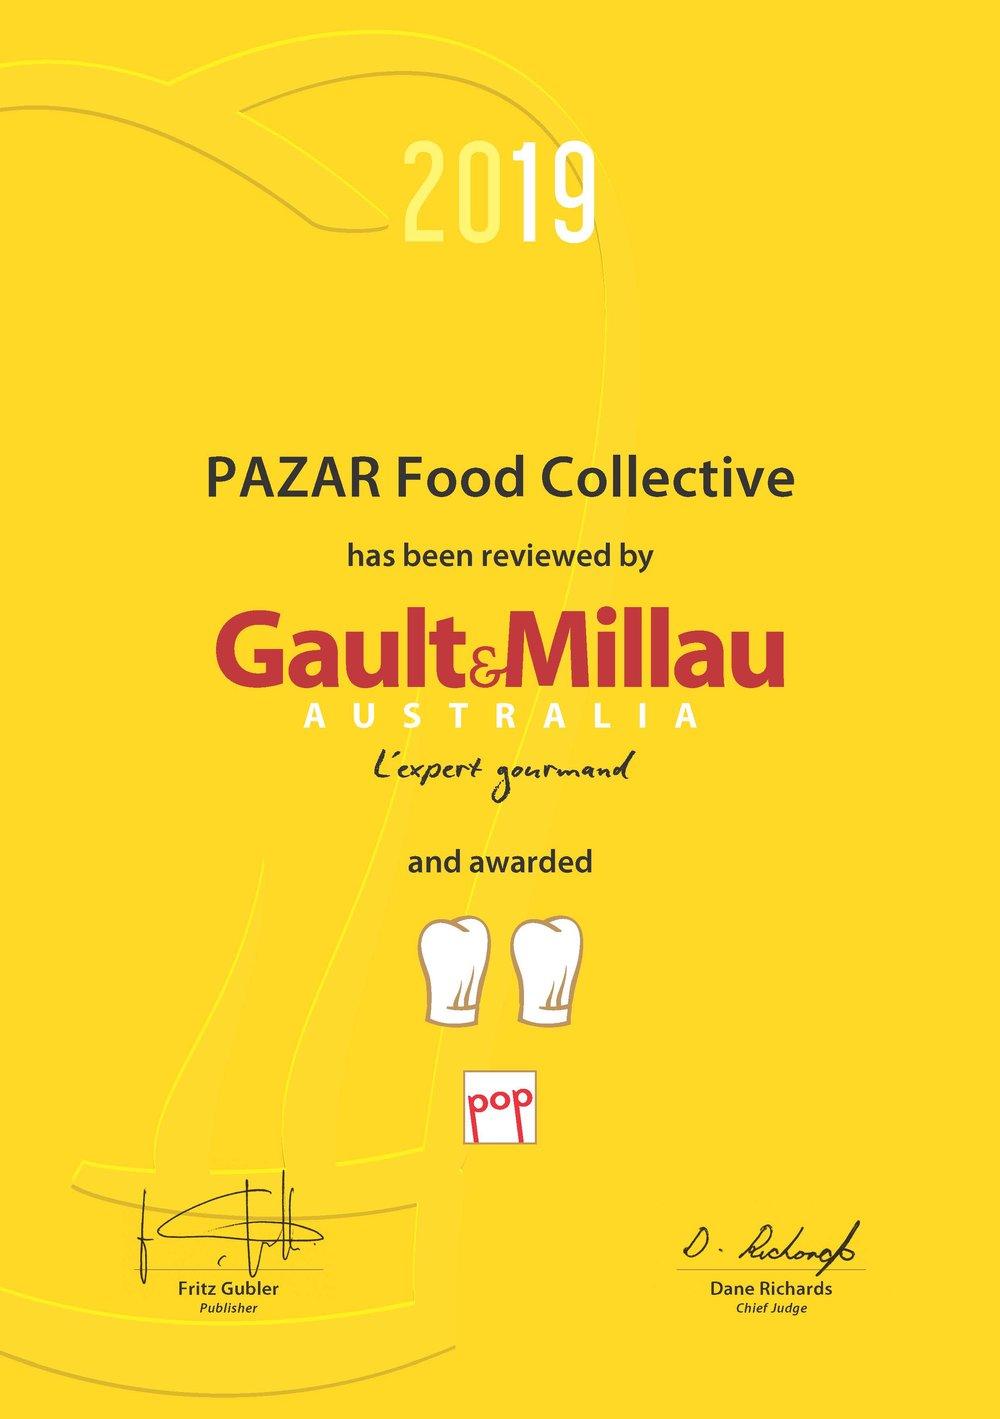 G&M_2019_Certificate_PAZAR Food Collective.jpg